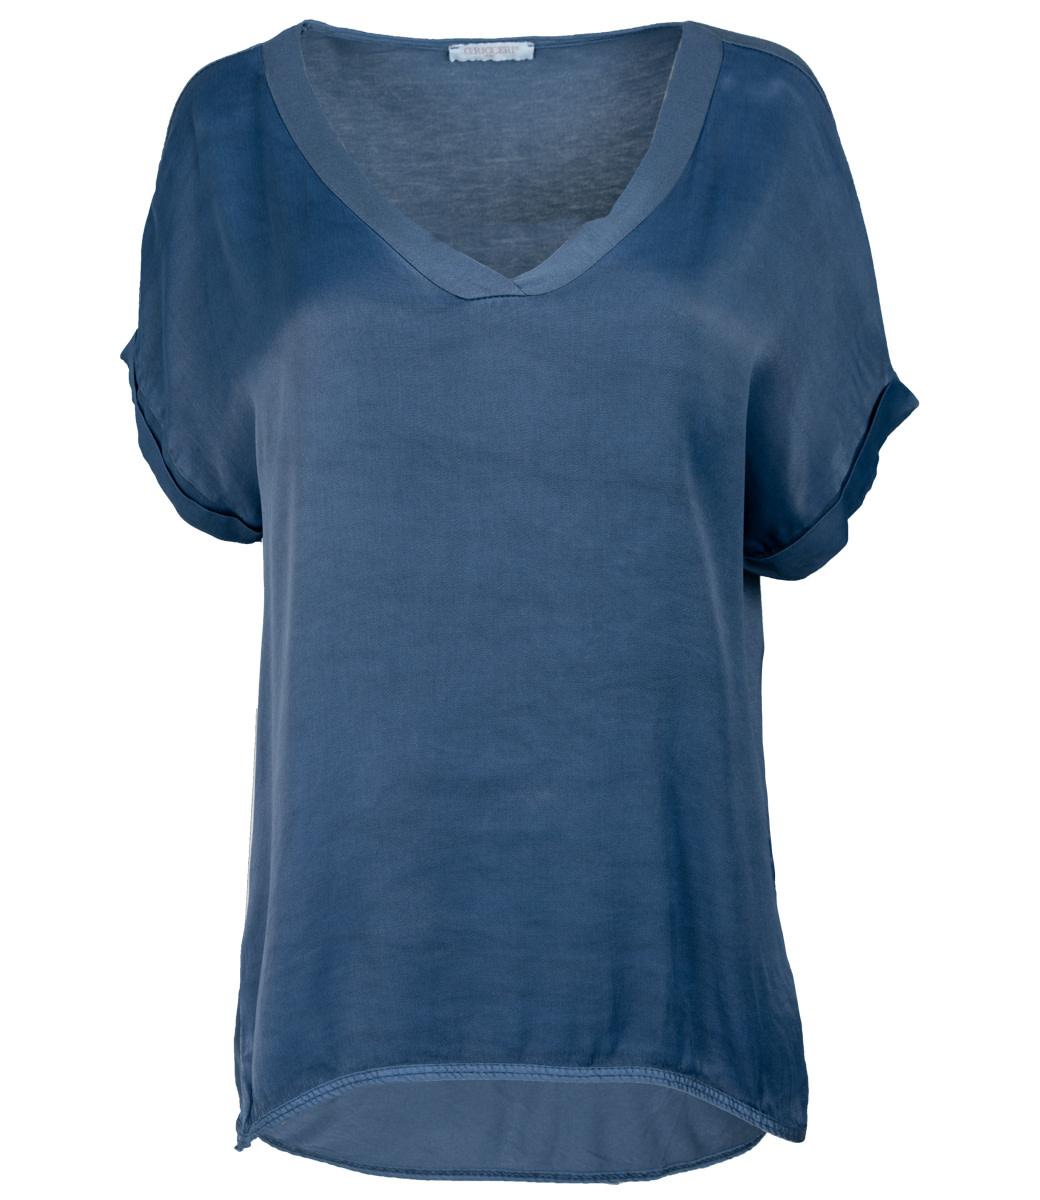 Gemma Ricceri Shirt blauw silk touch v hals